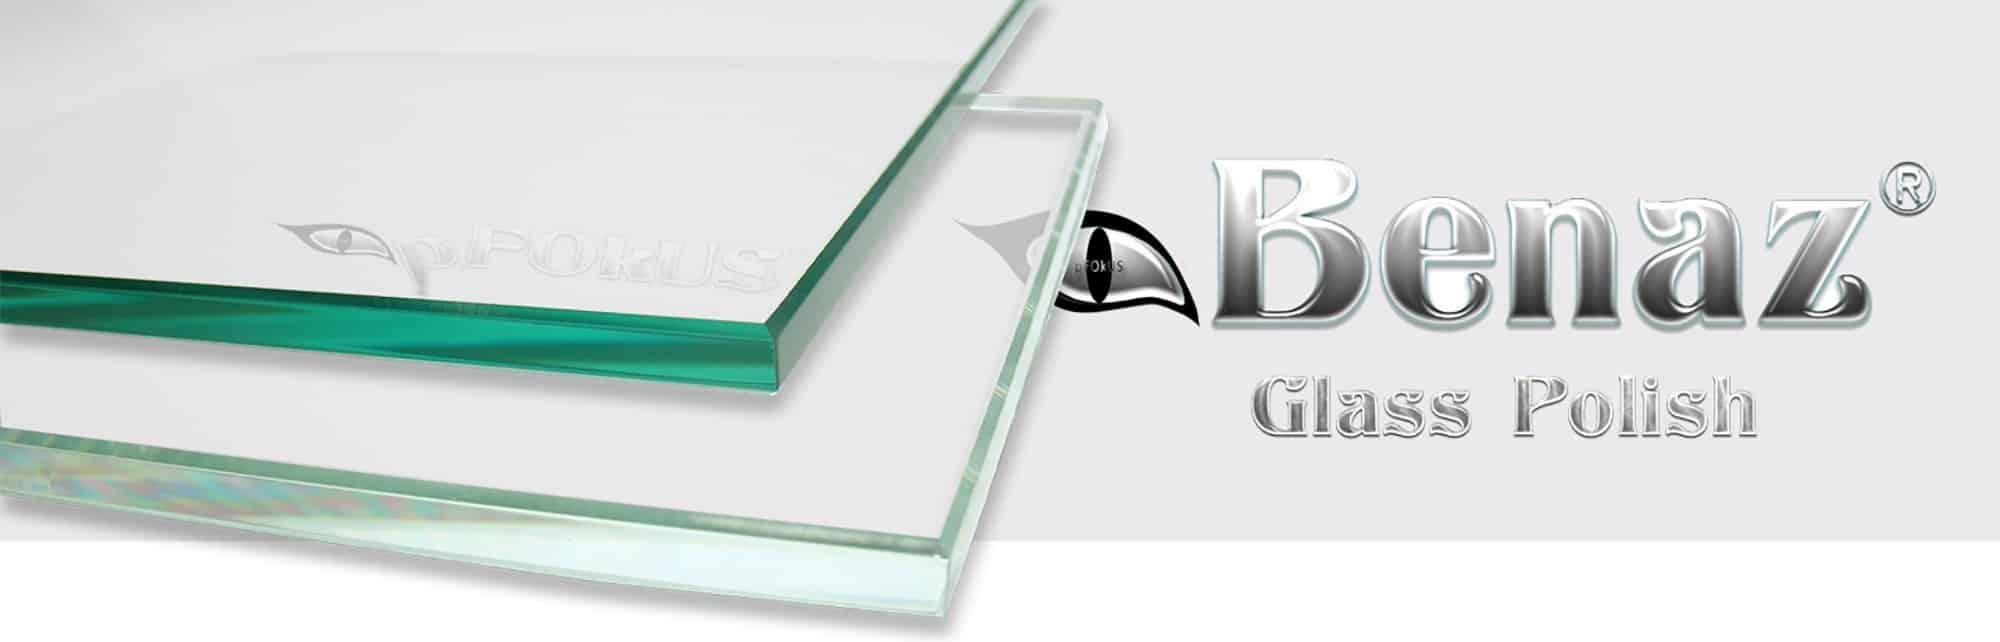 Best Cleaner For Glass Shower Doors Water Spot Remover Pfokus